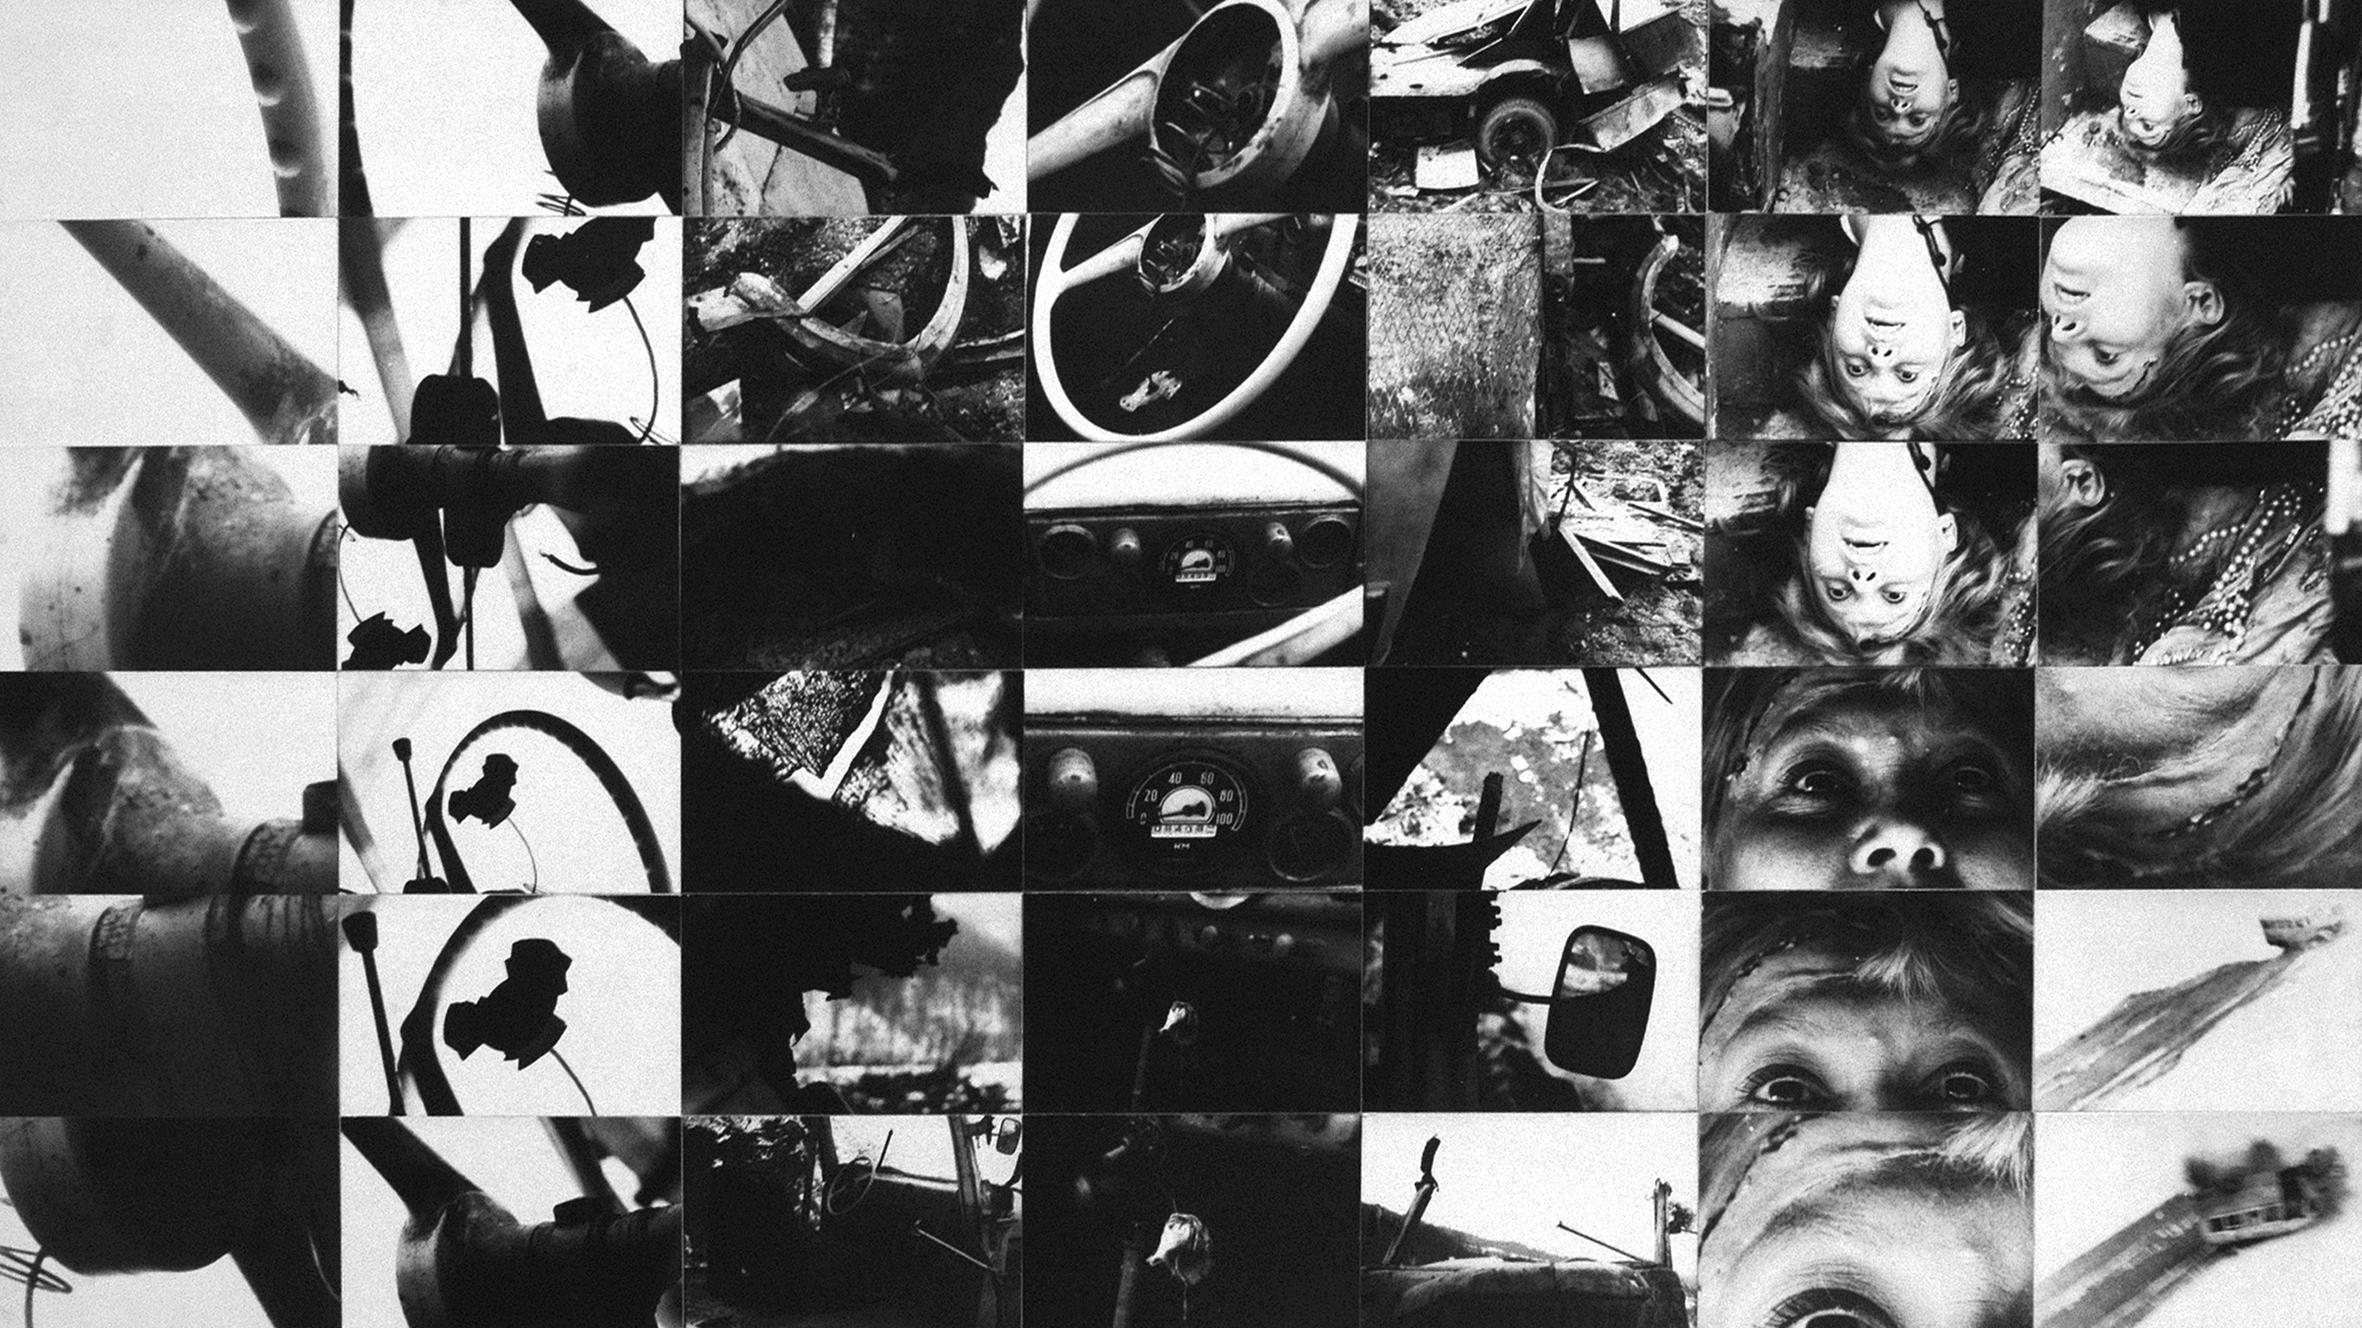 Ryszard Wasko, The Accident (apolice record), 1971, gelatin silver print, 64 x 97 cm © the artist courtesy Zak | Branicka